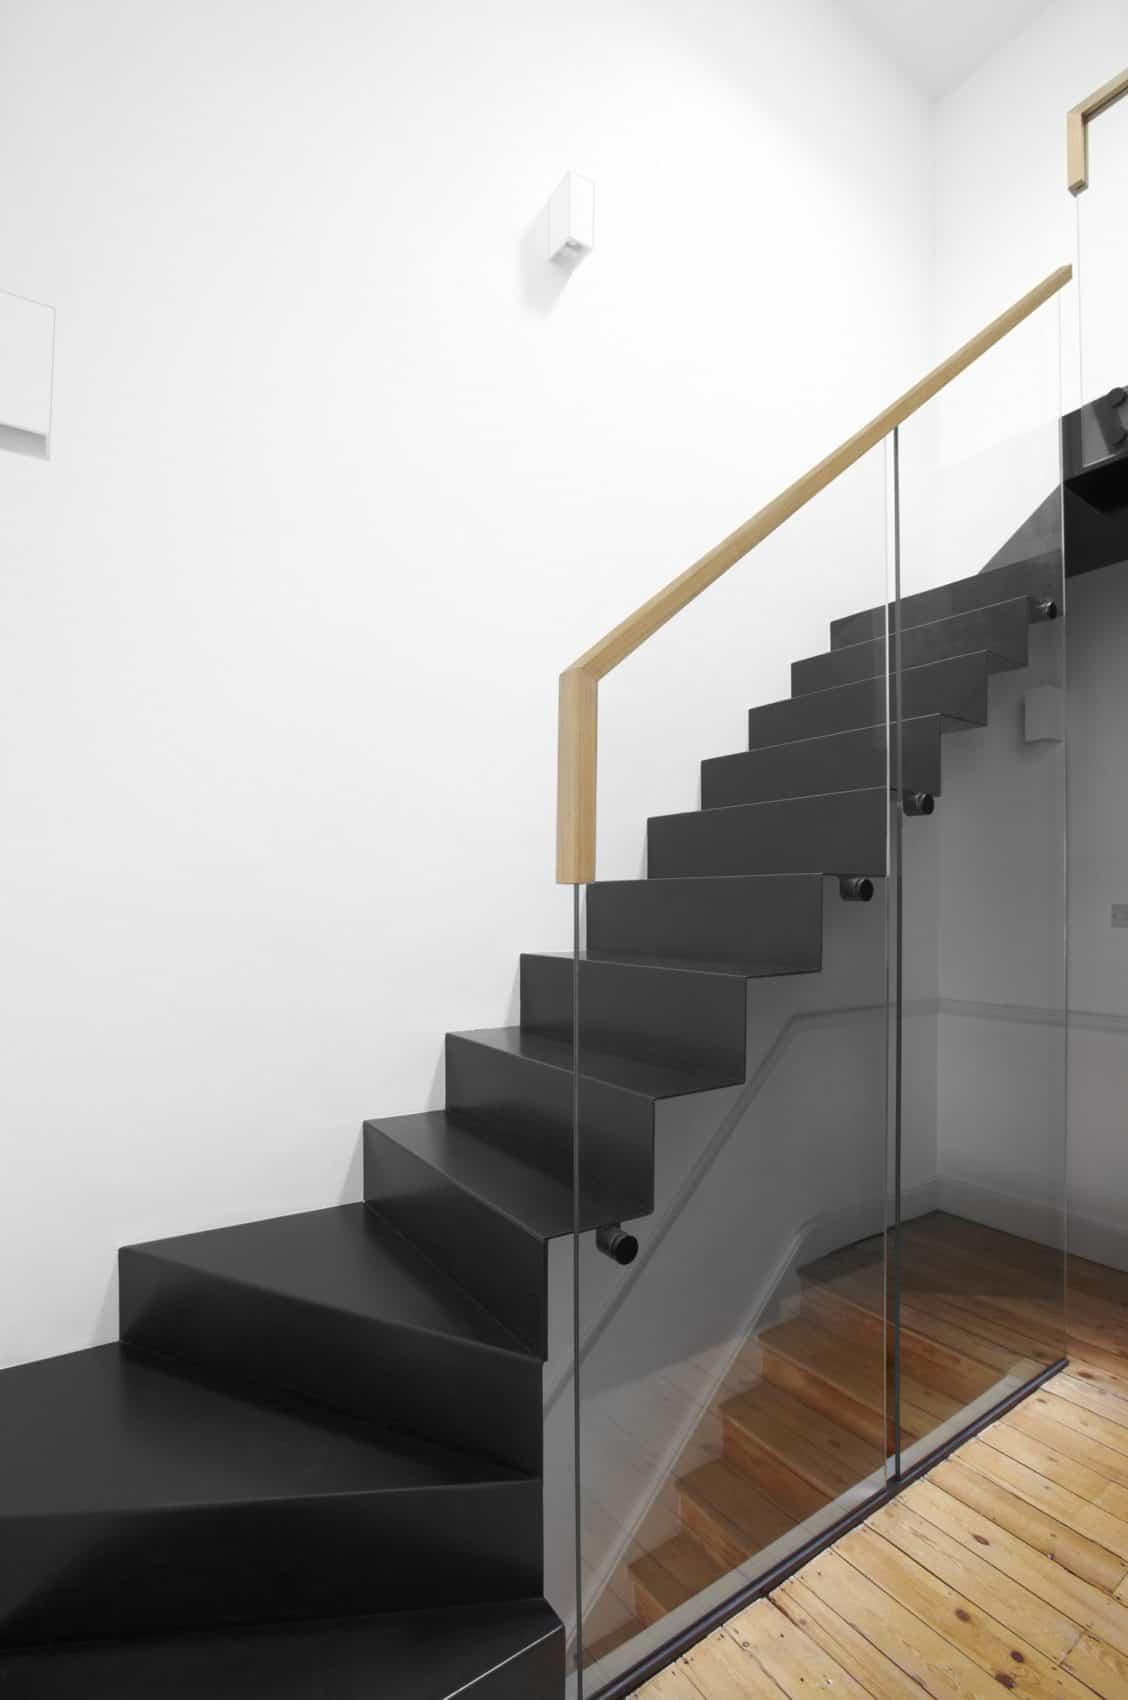 House in Black by draisci studio (11)